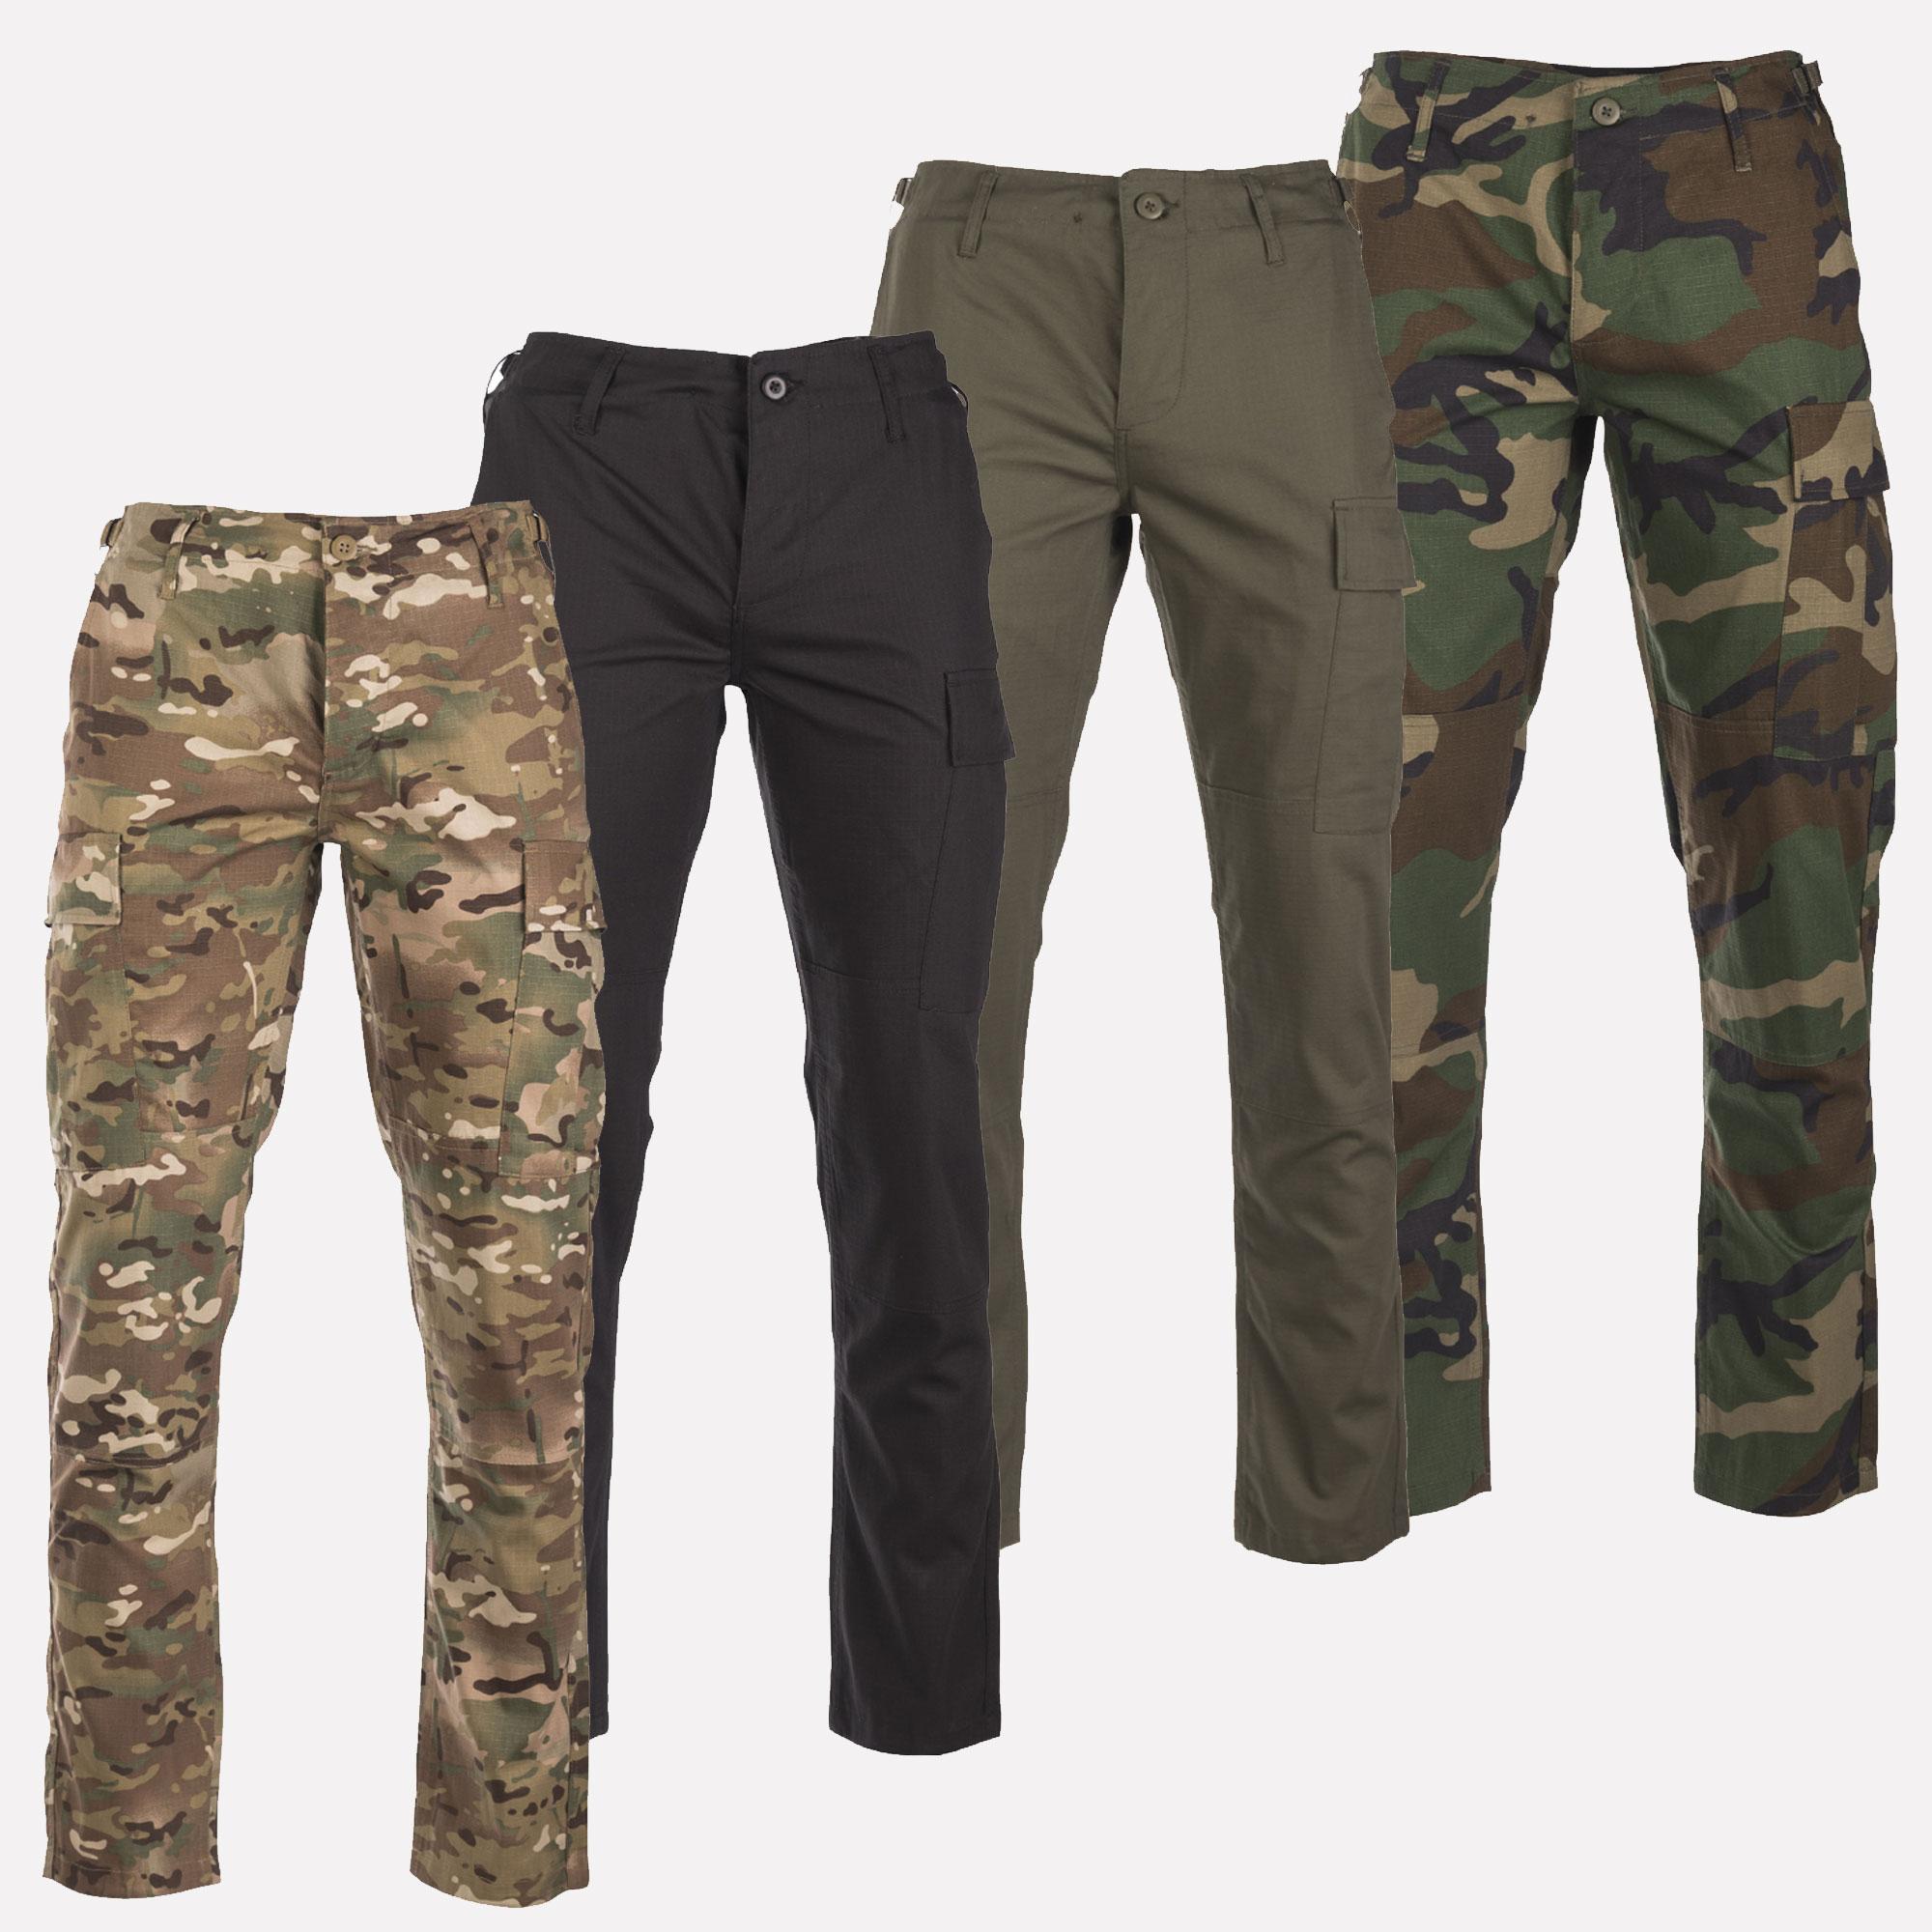 Goodthreads Slim-fit Ripstop Cargo Pantalones Marca